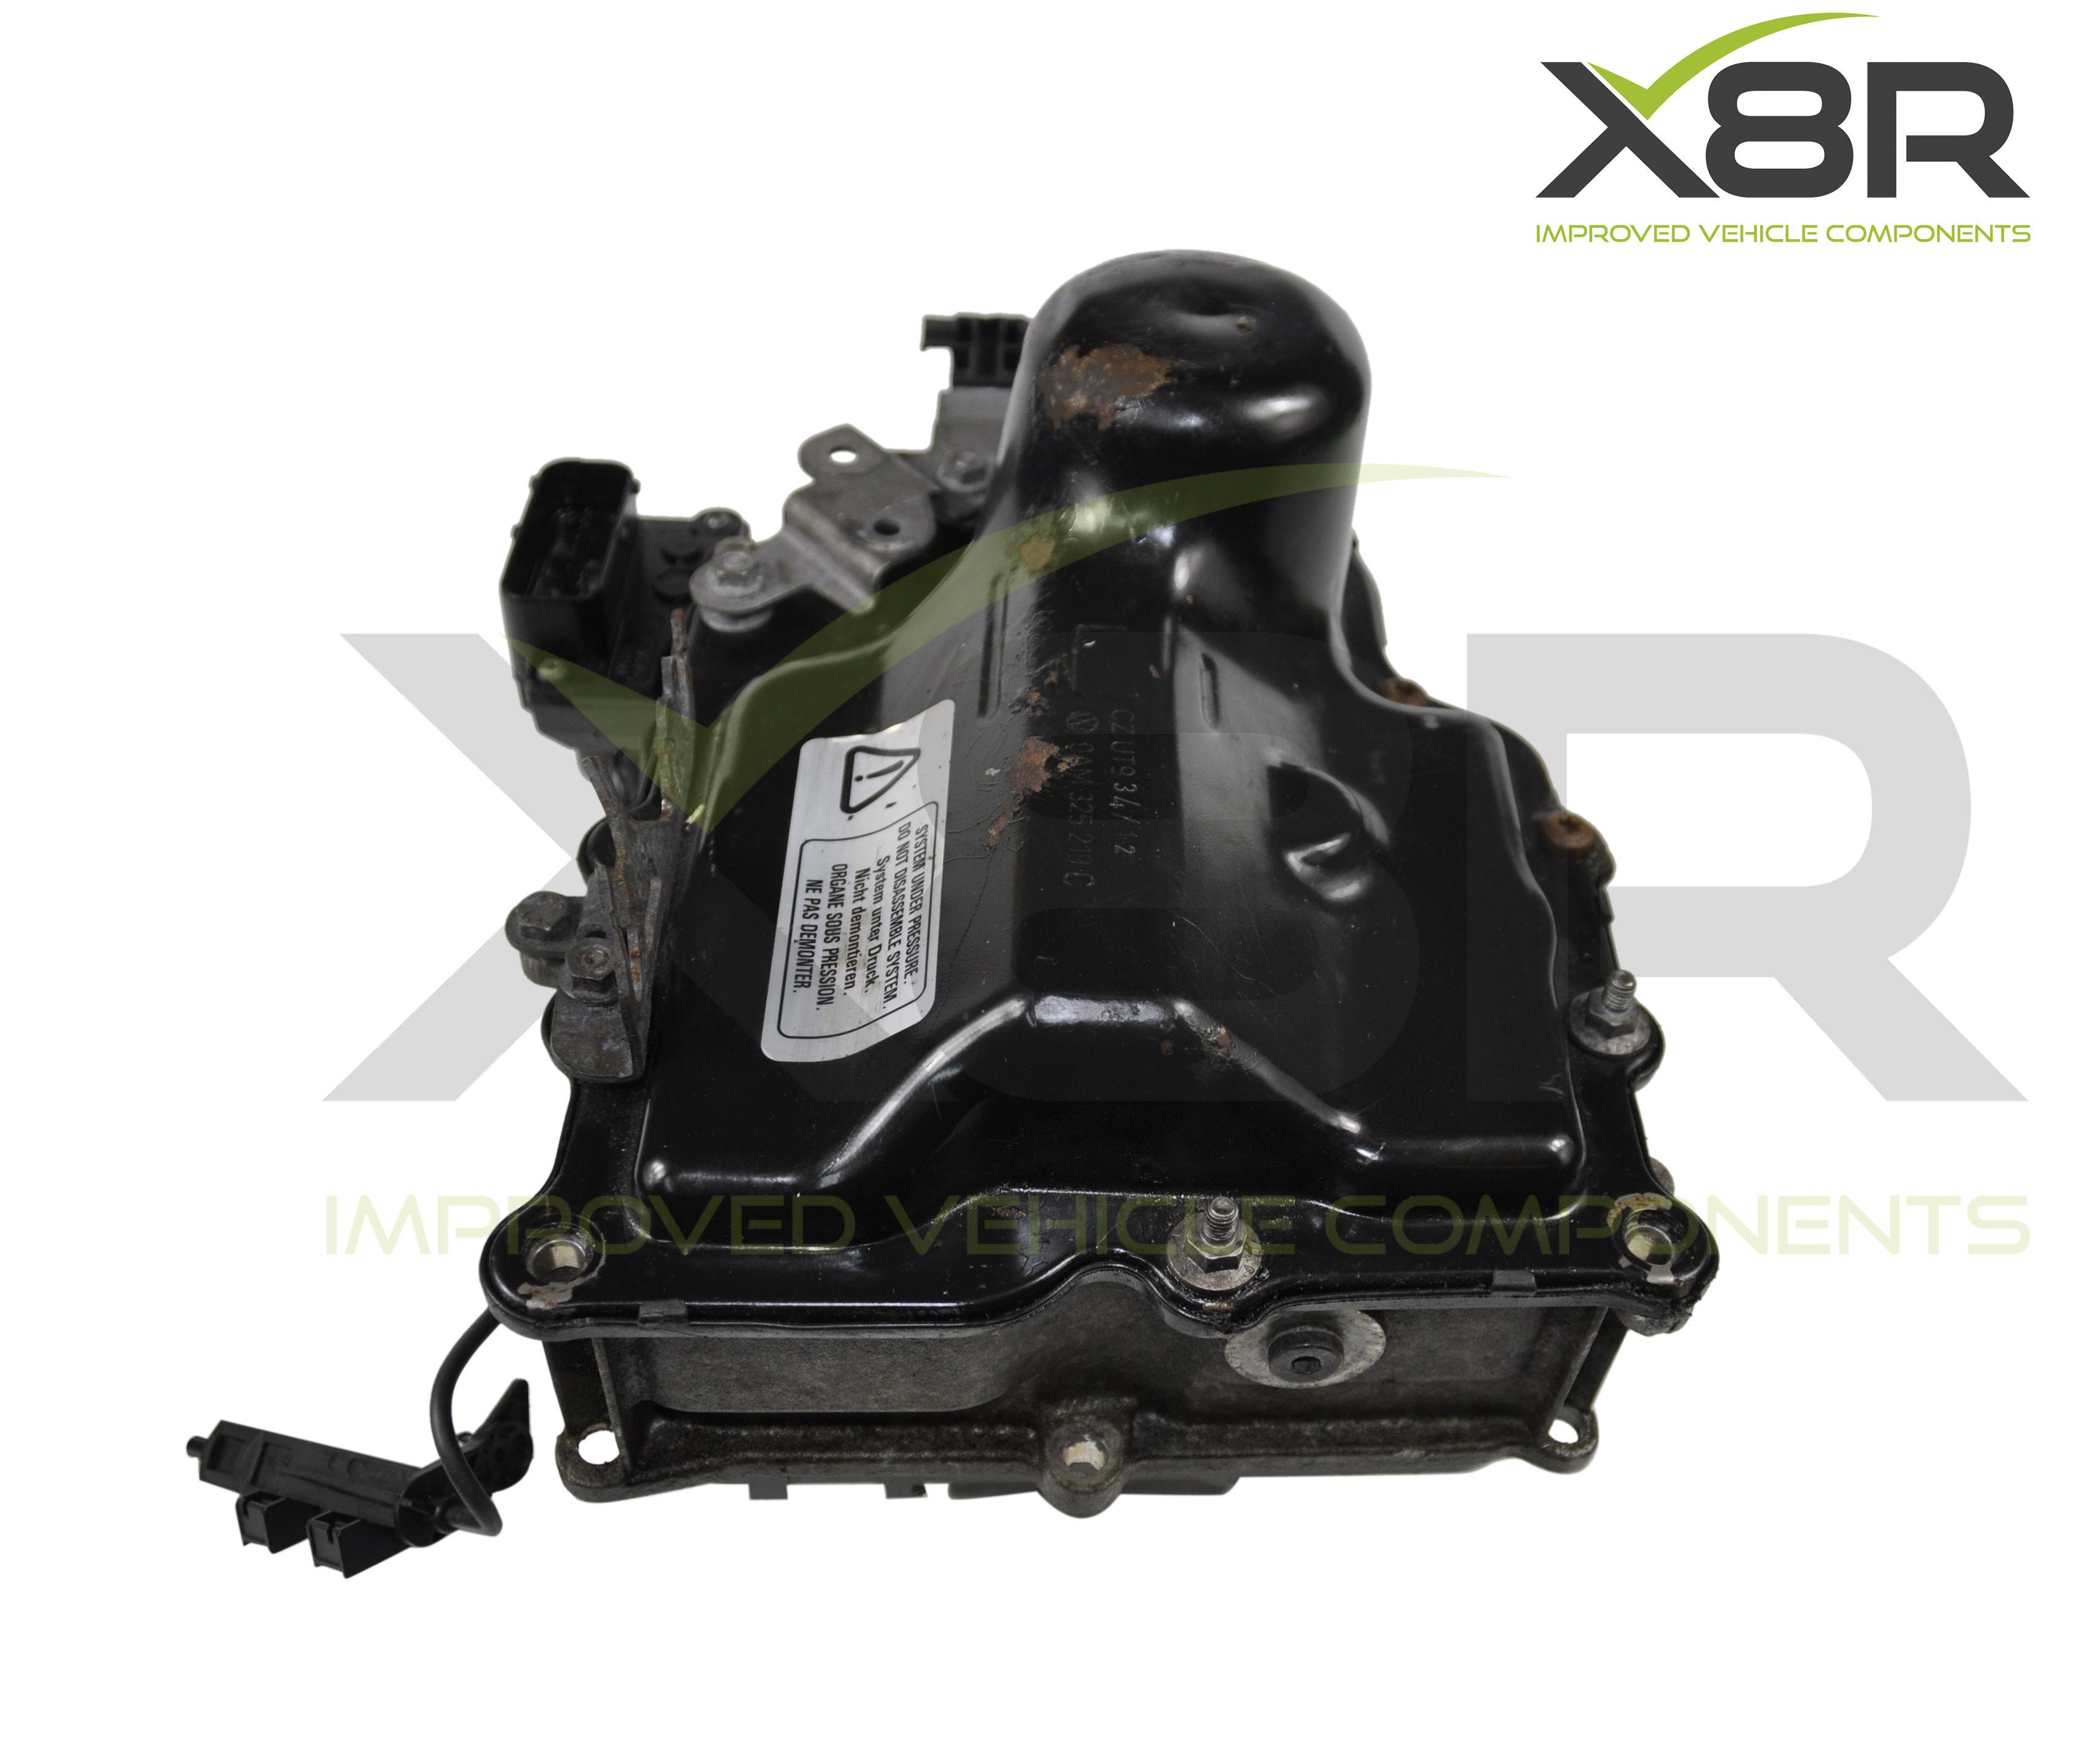 DSG / 0AM Mechatronic Unit 7 Speed Gearbox Hydraulic Accumulator Repair Kit Replacement Overhaul Leaking Crack Repair Fix VW AUDI SKODA SEAT Install Instructions Guide